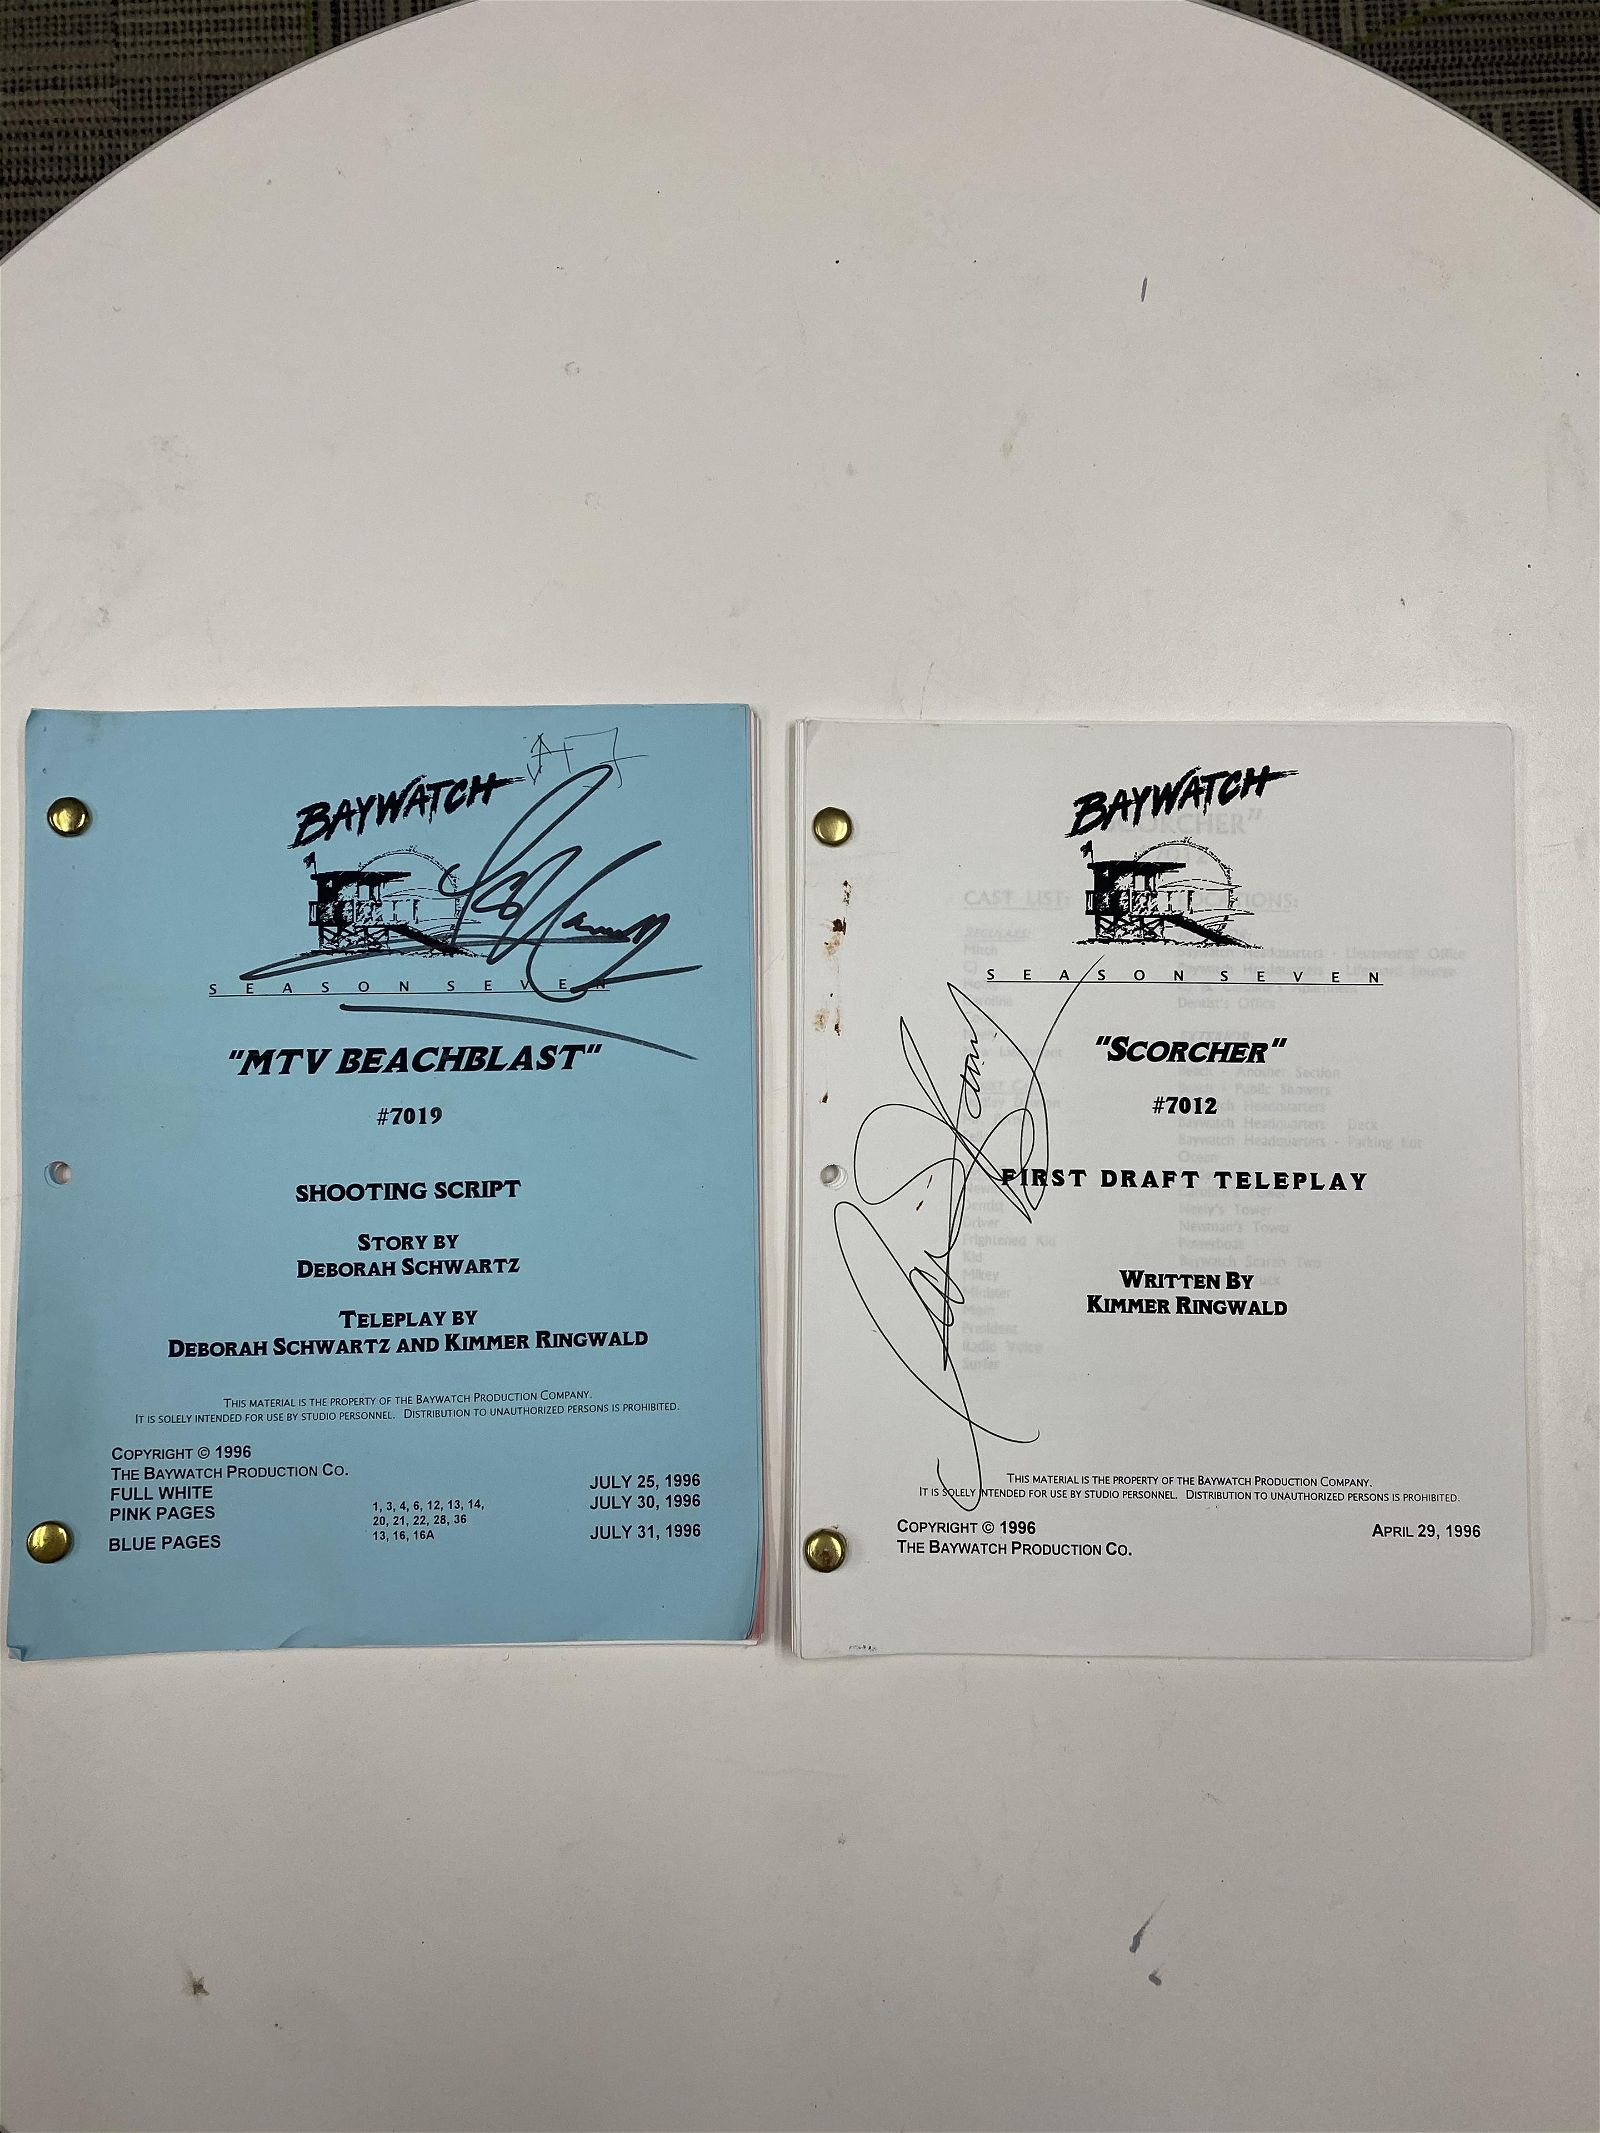 HASSELHOFF AUTOGRAPHED BAYWATCH SEASON 7 TELEPLAY